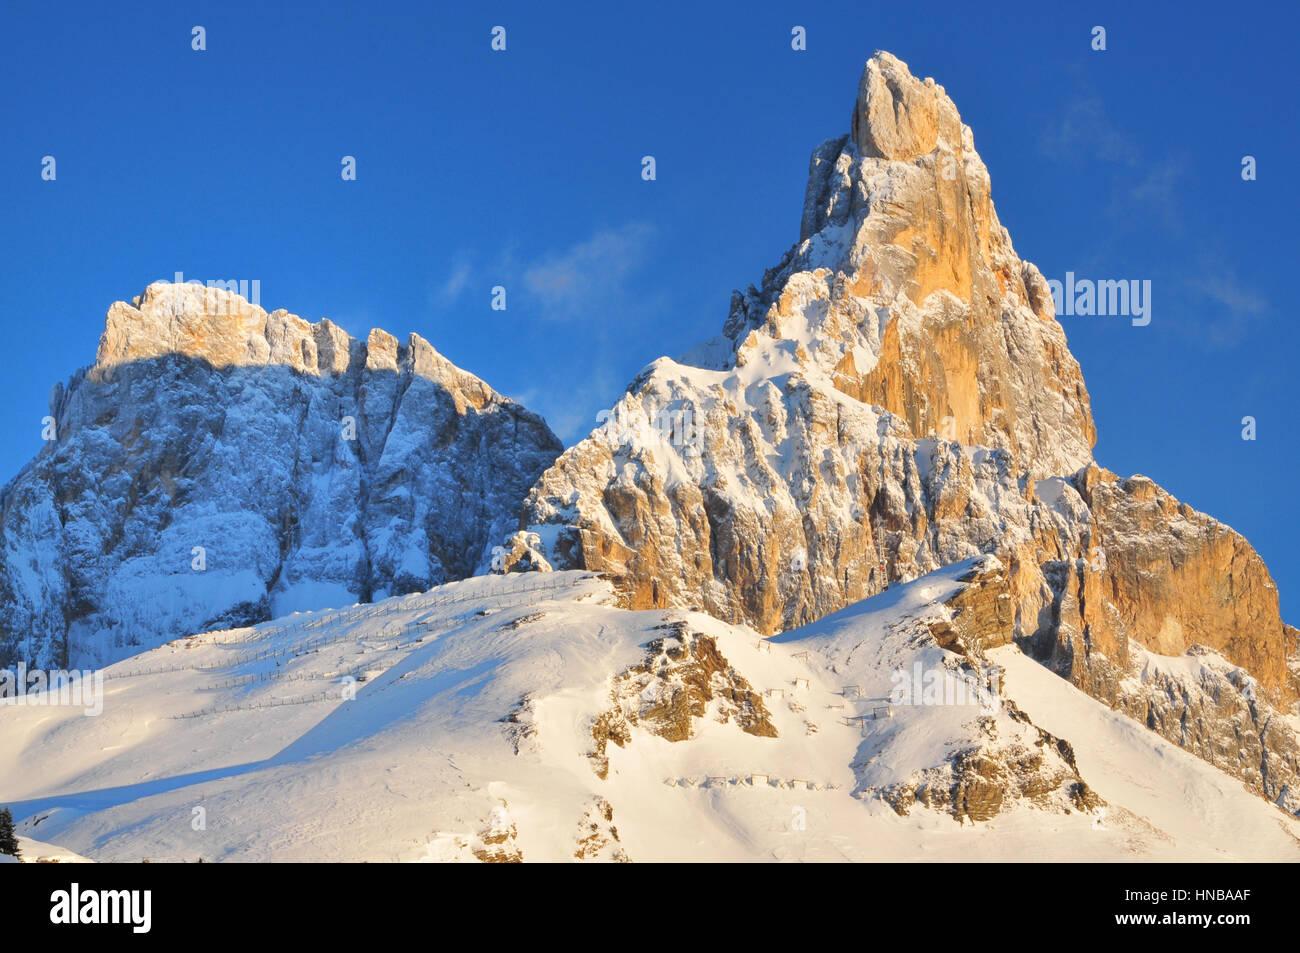 San Martino Passo Rolle Dolomiti Alps Italy - Stock Image